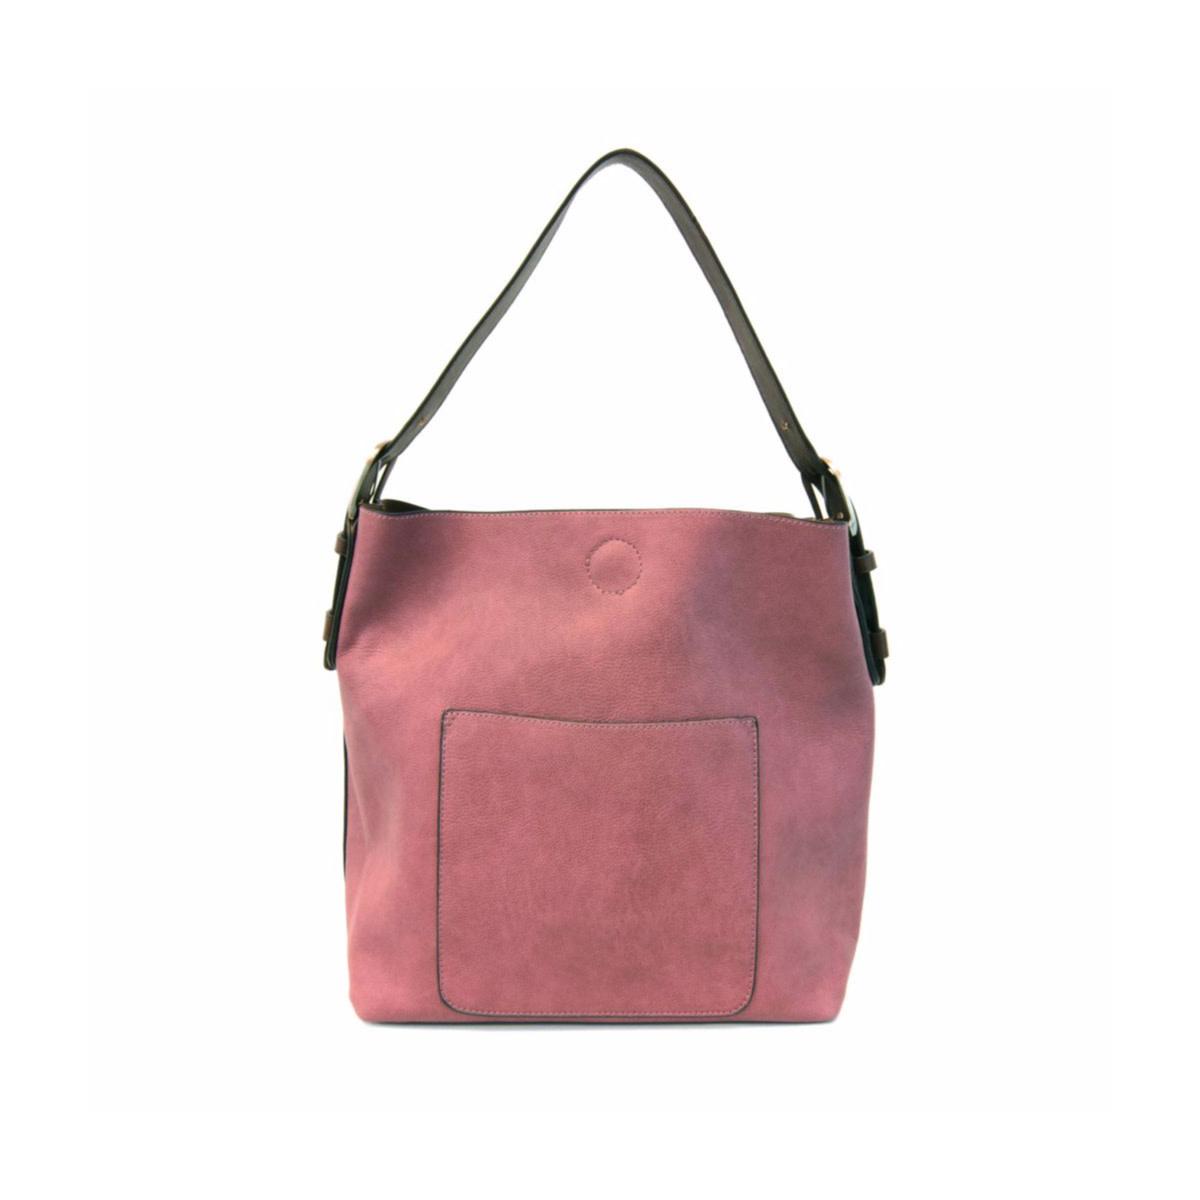 Joy Susan Joy Susan Classic Hobo Handbag Dark Raspberry